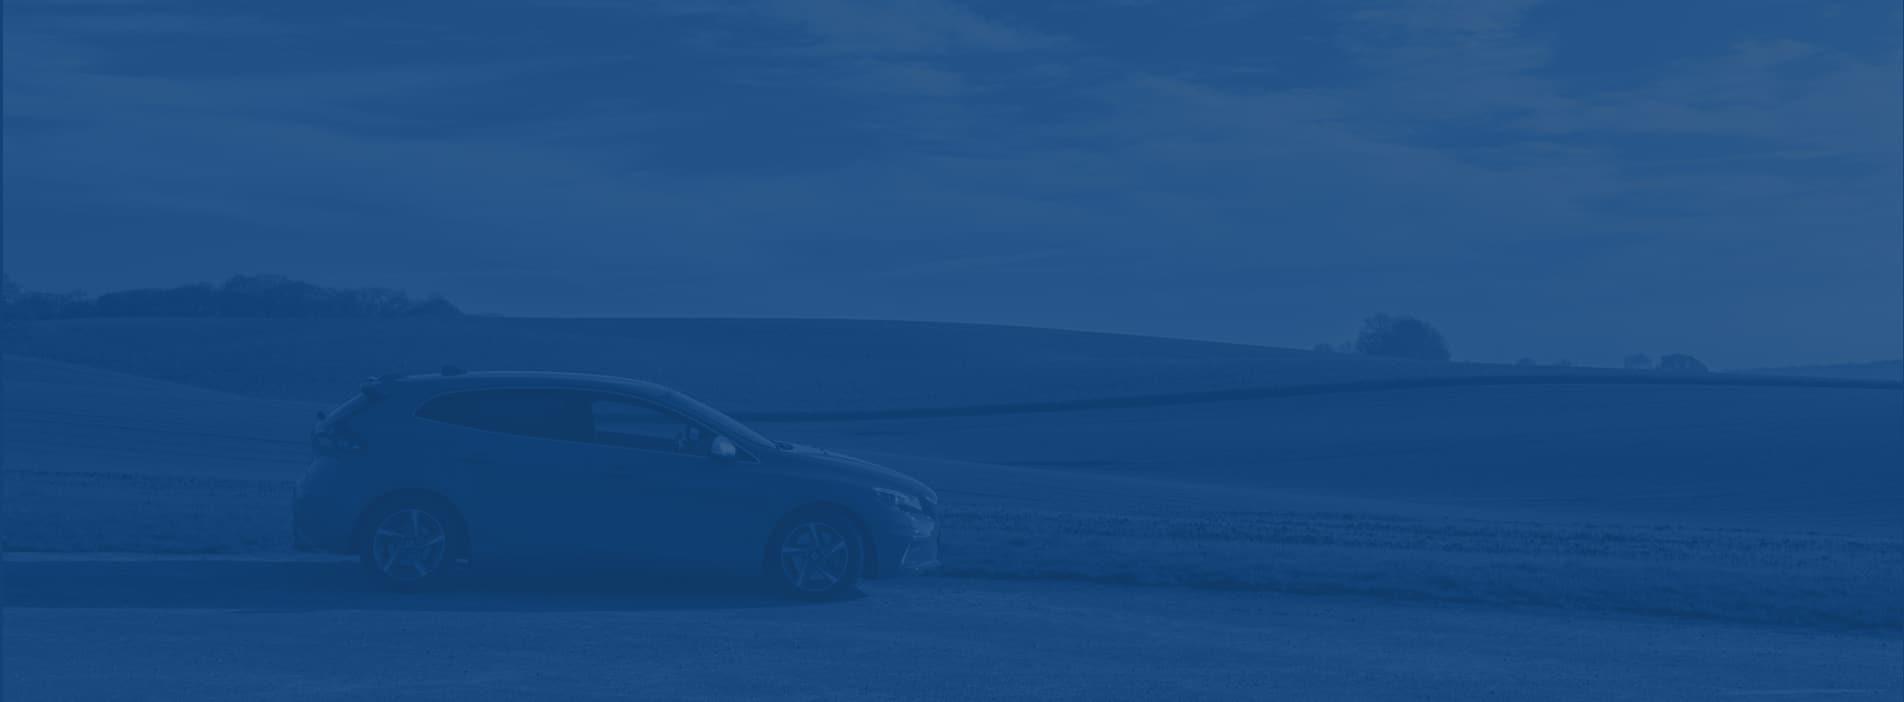 lp car image 1